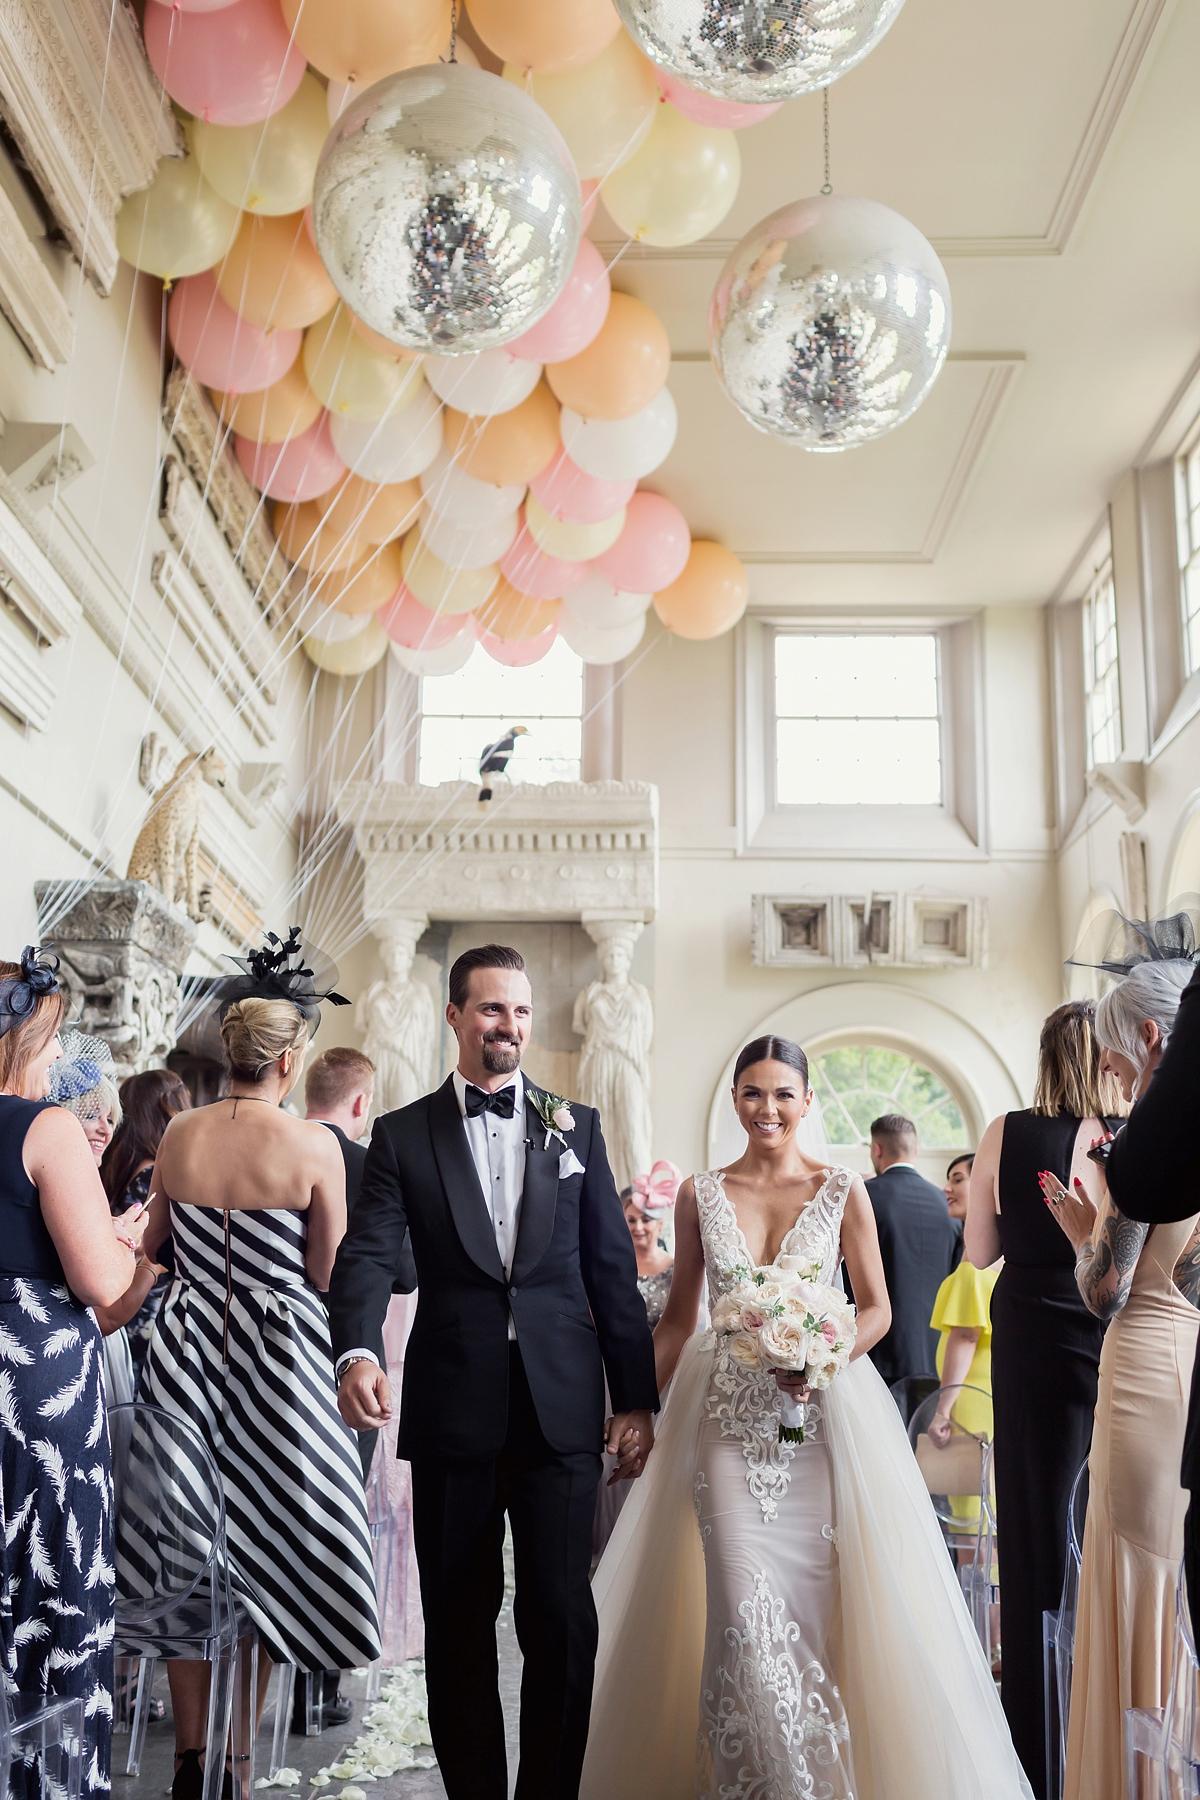 5a3d235d182 berta bride aynhoe park wedding - Aynhoe Park Black Tie + Berta Bride  Glamour for a